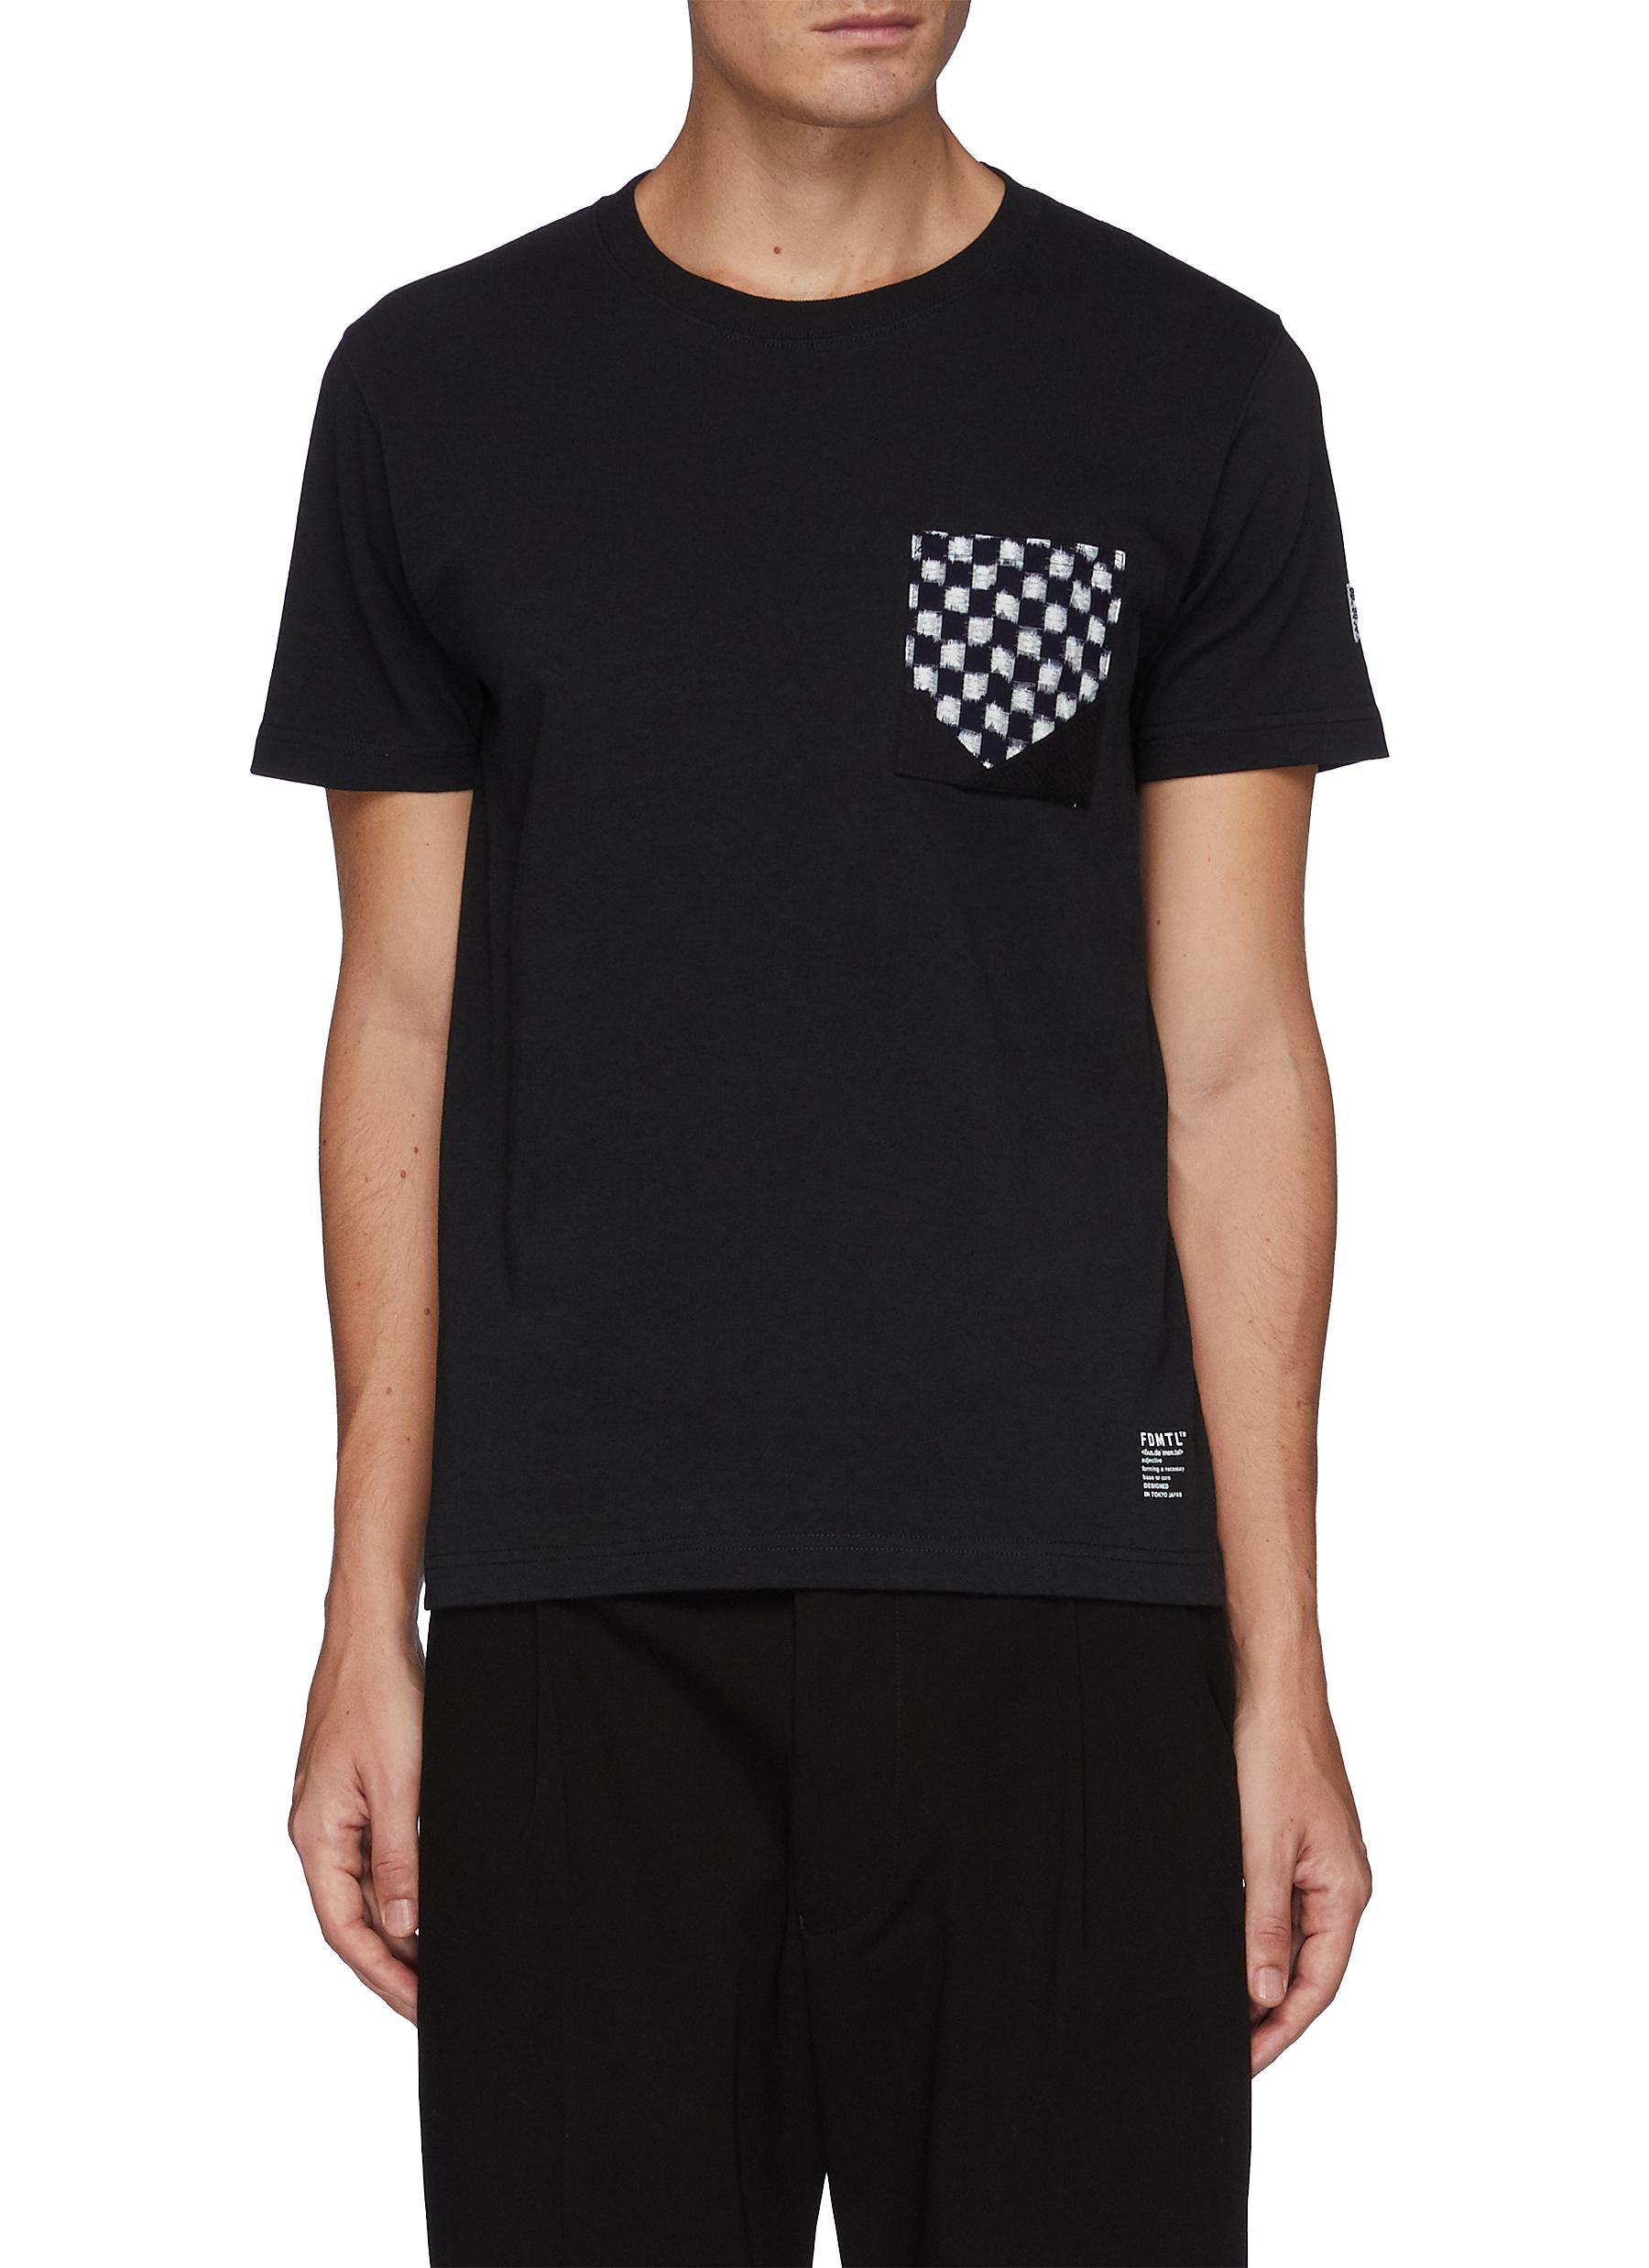 Blurred Check Chest Patch Crewneck Cotton T-shirt